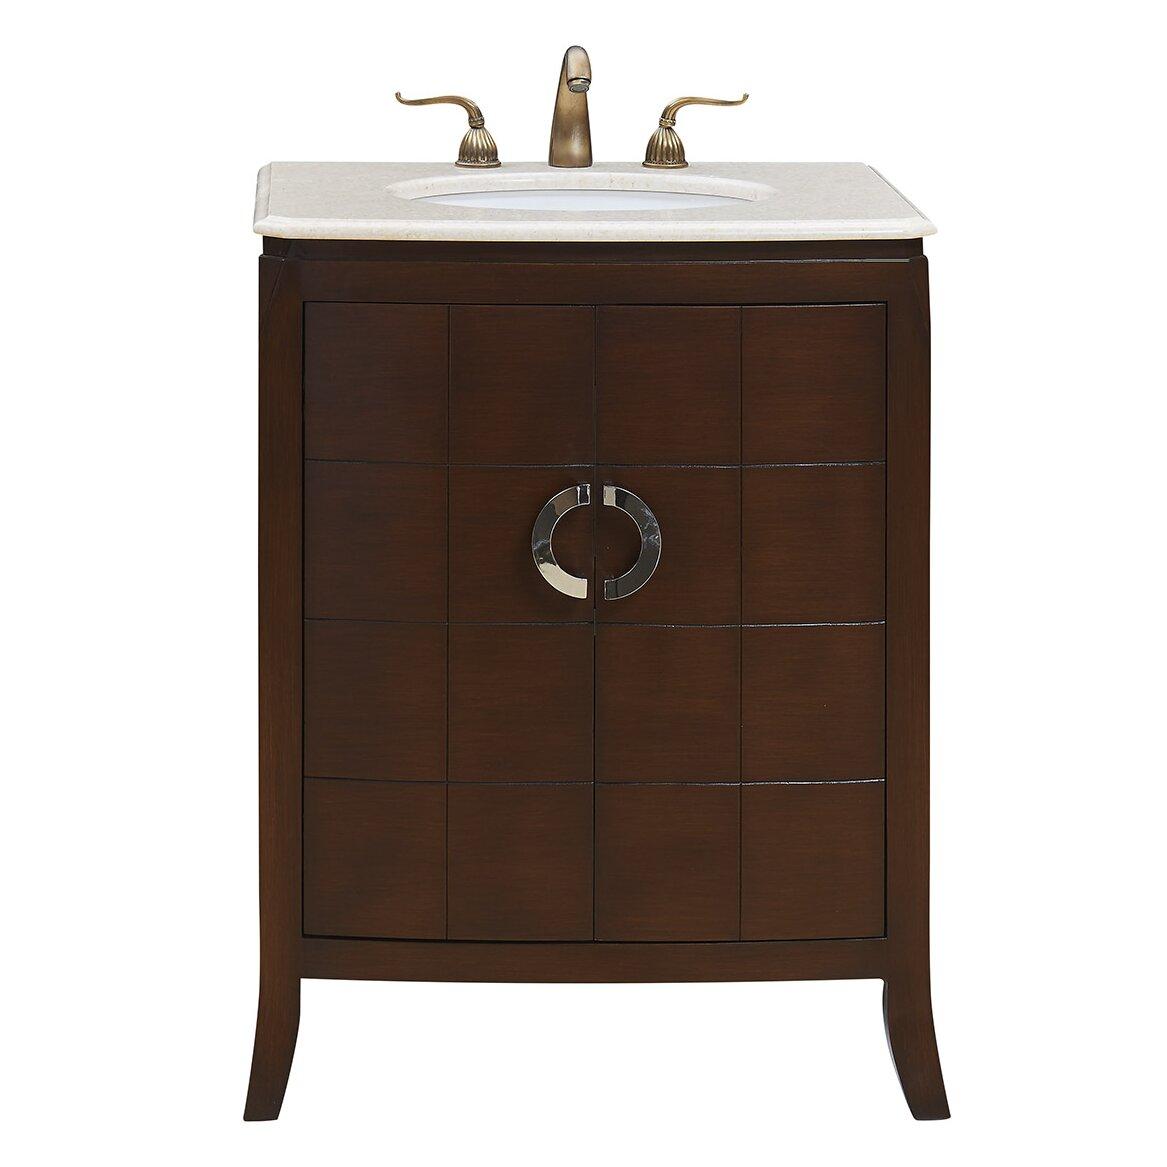 Elegant Bathroom Vanity Lights : Elegant Lighting Nouveau 27